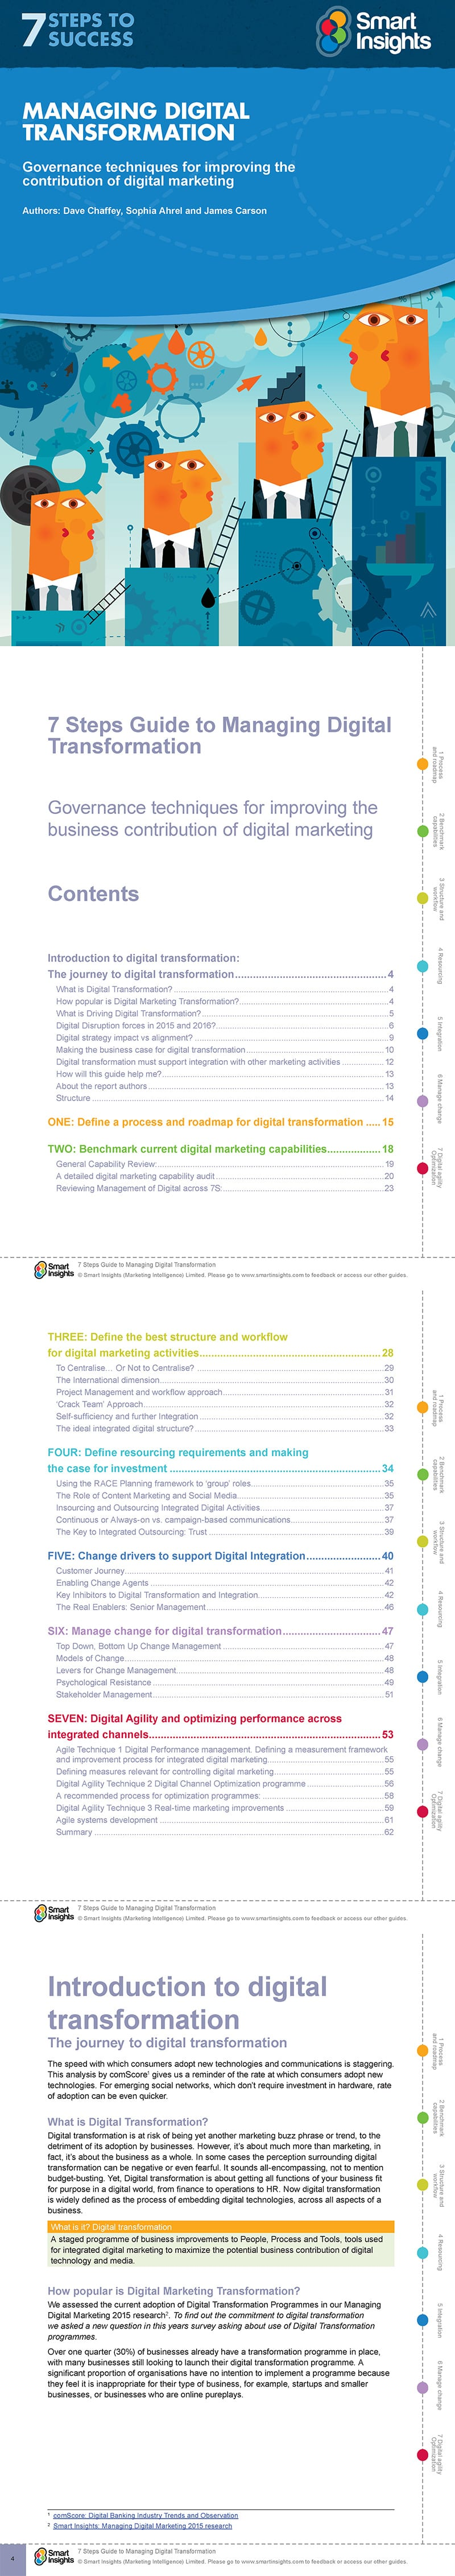 Managing Digital Transformation Guide